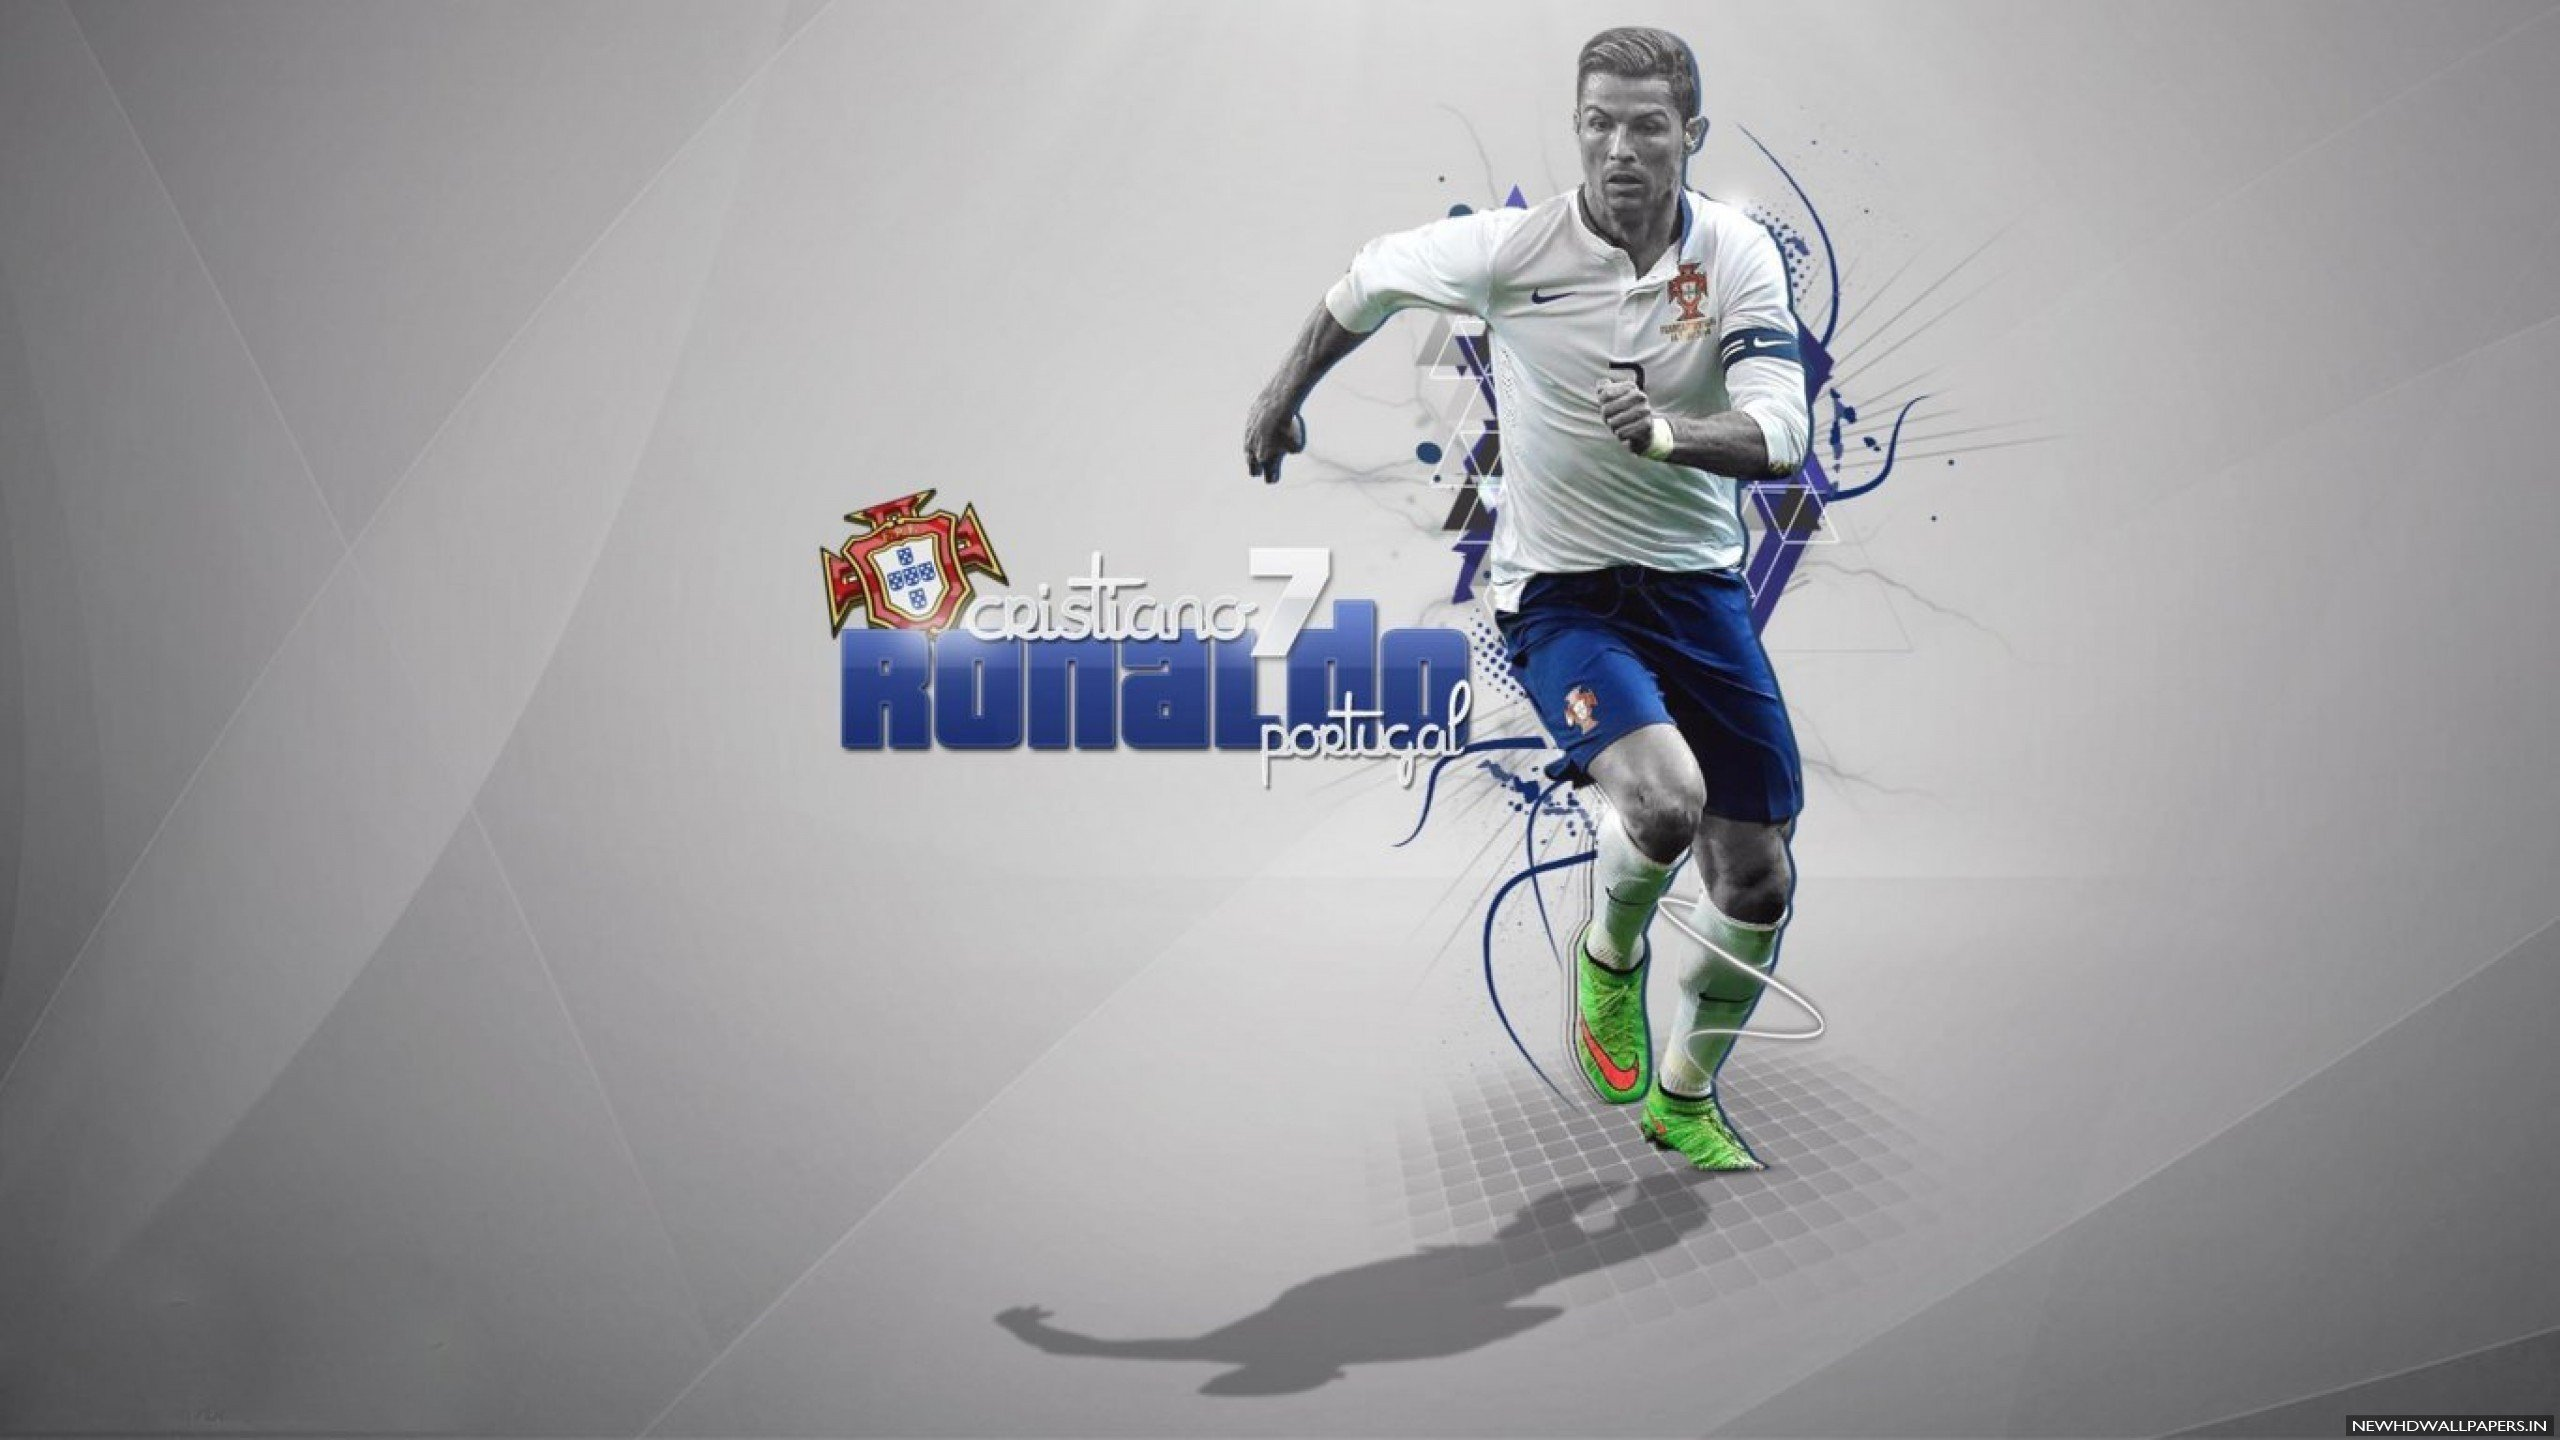 Cristiano Ronaldo 2015 HD Wallpapers   New HD Wallpapers 2560x1440